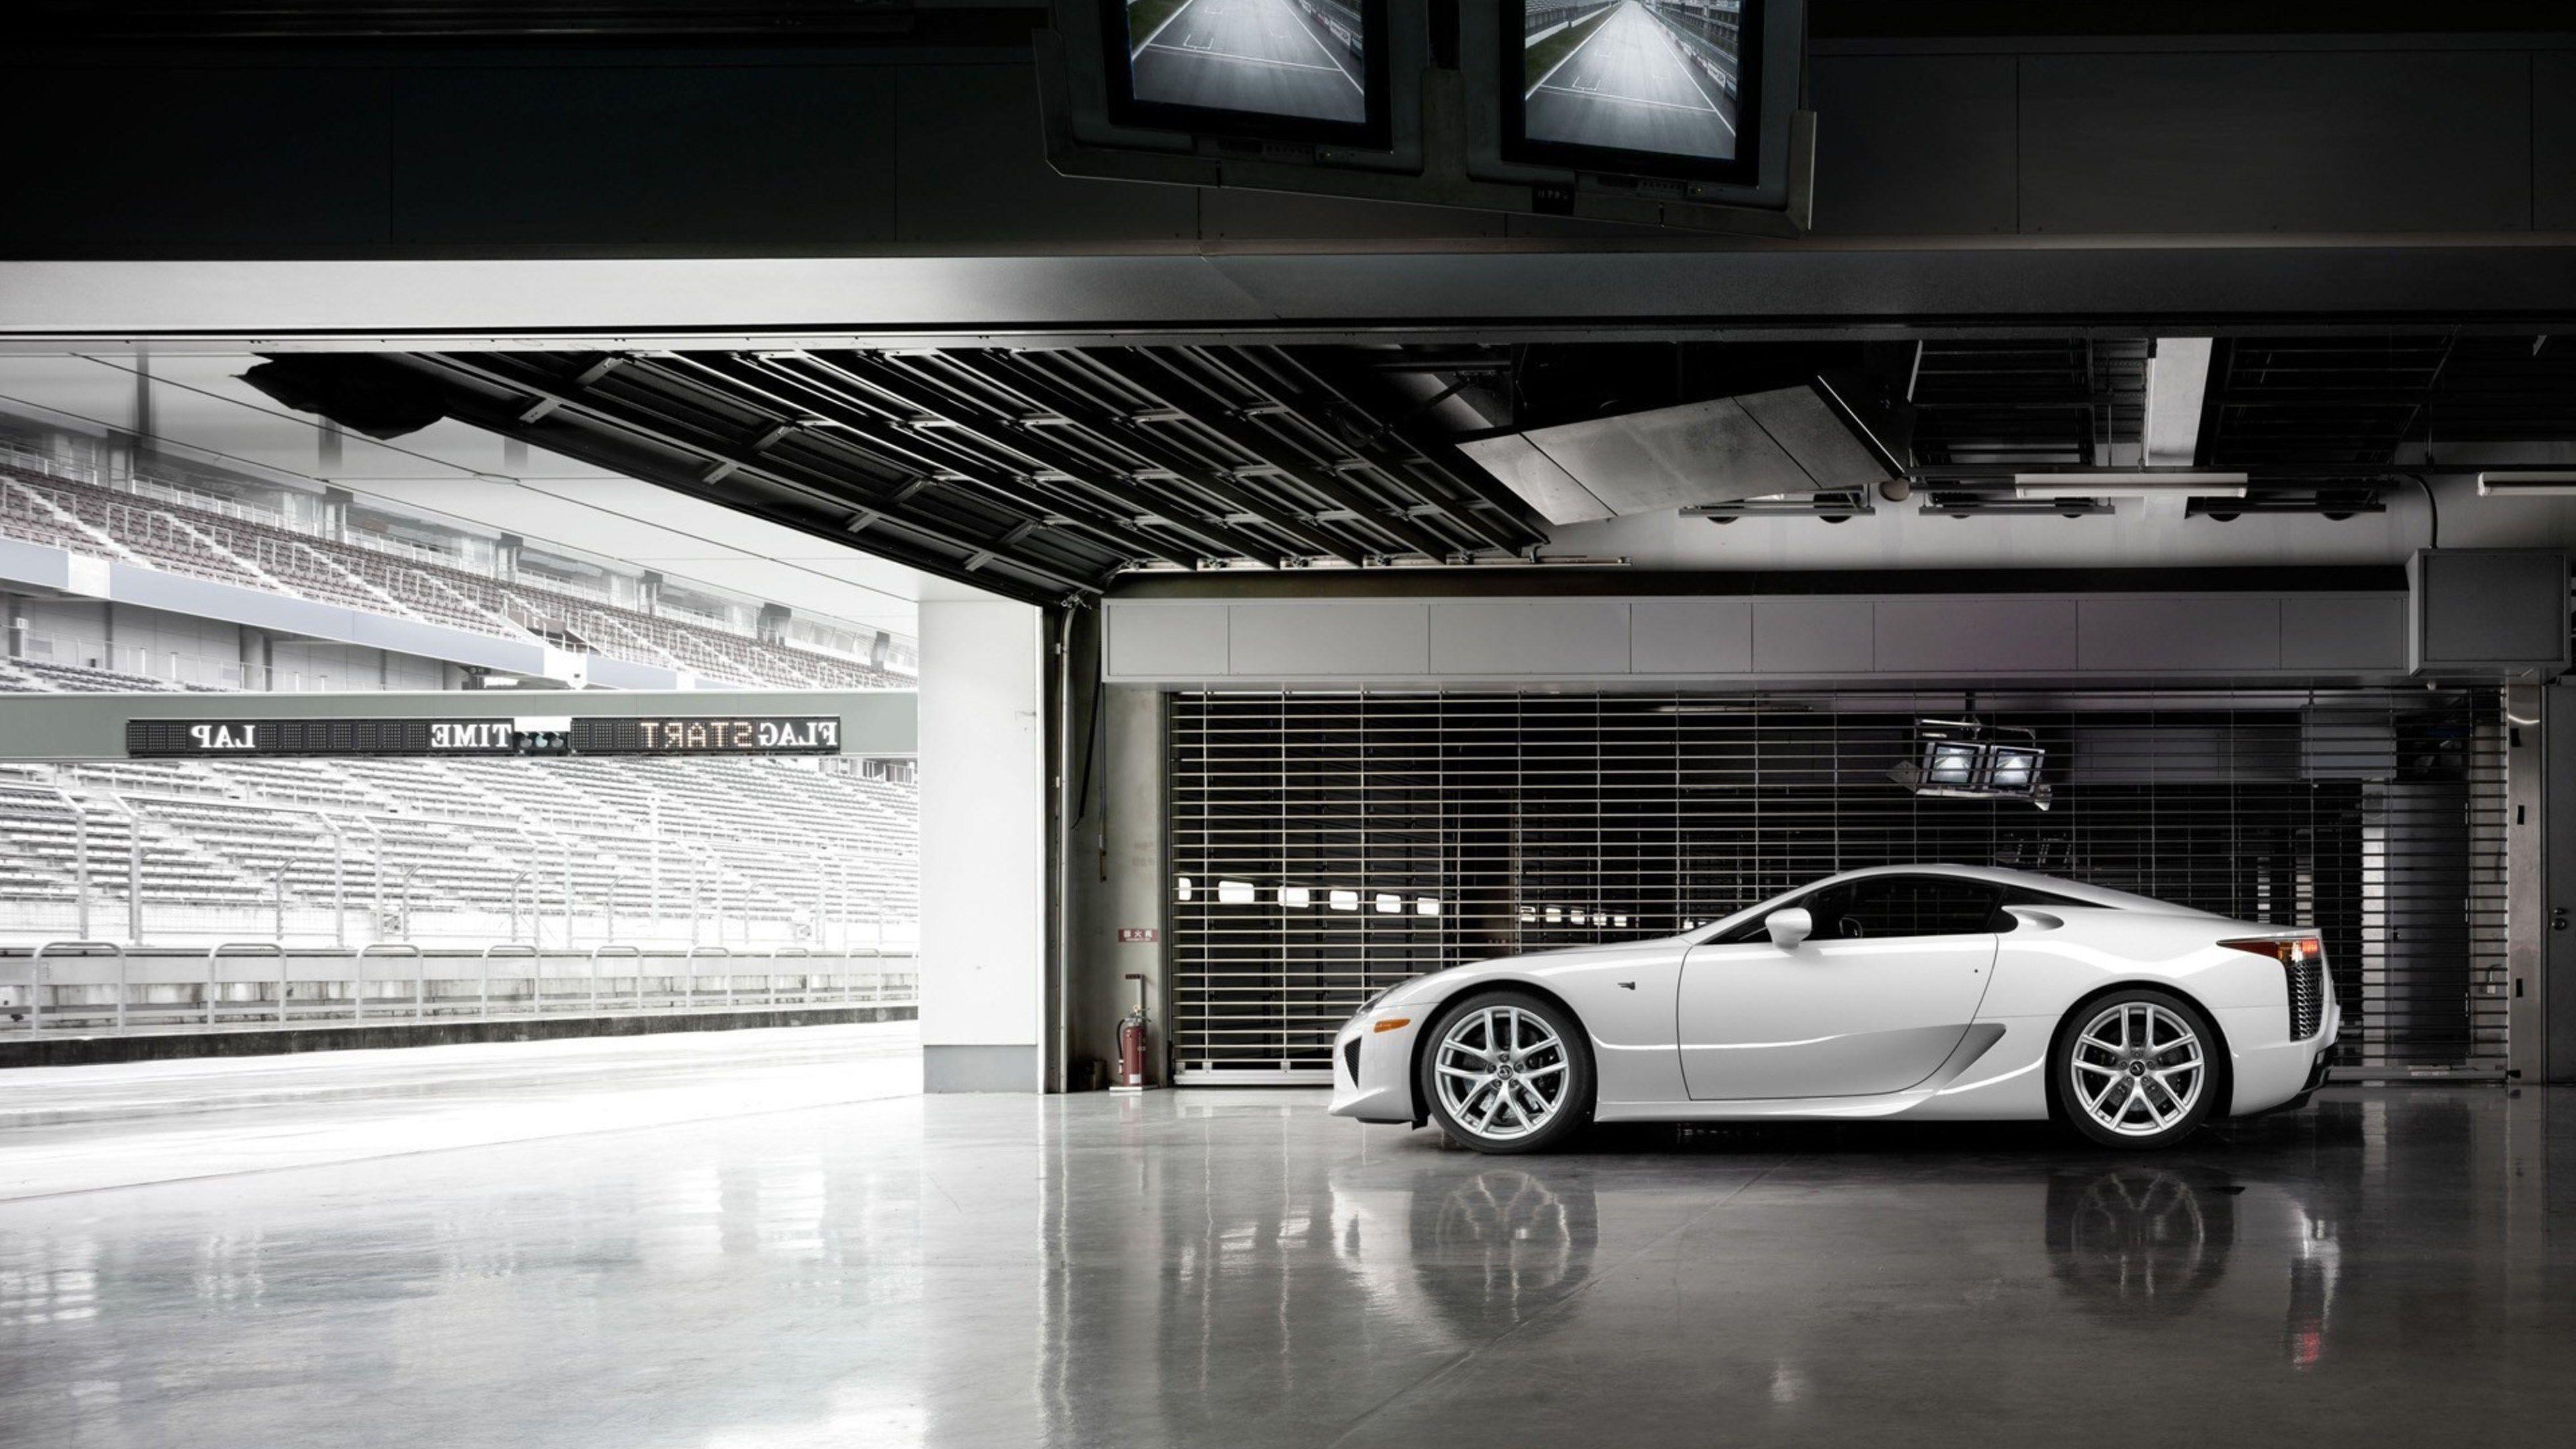 Lexus Lfa For Desktop Lexus Lfa Lexus Lfa Wallpapers Lexus